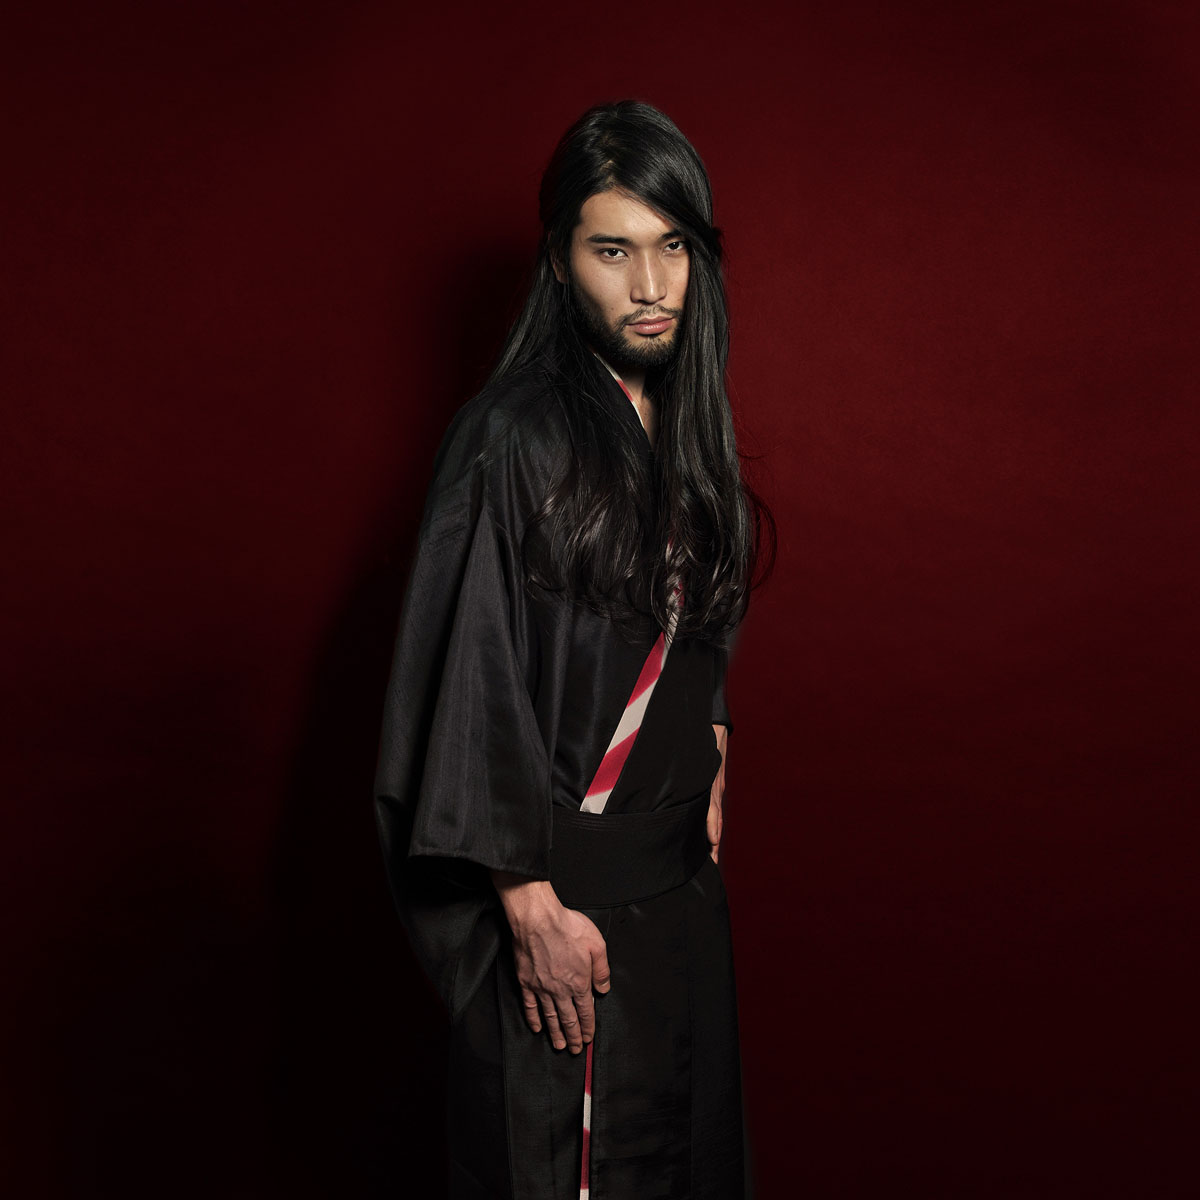 More Manly Kimono Tokyobling S Blog